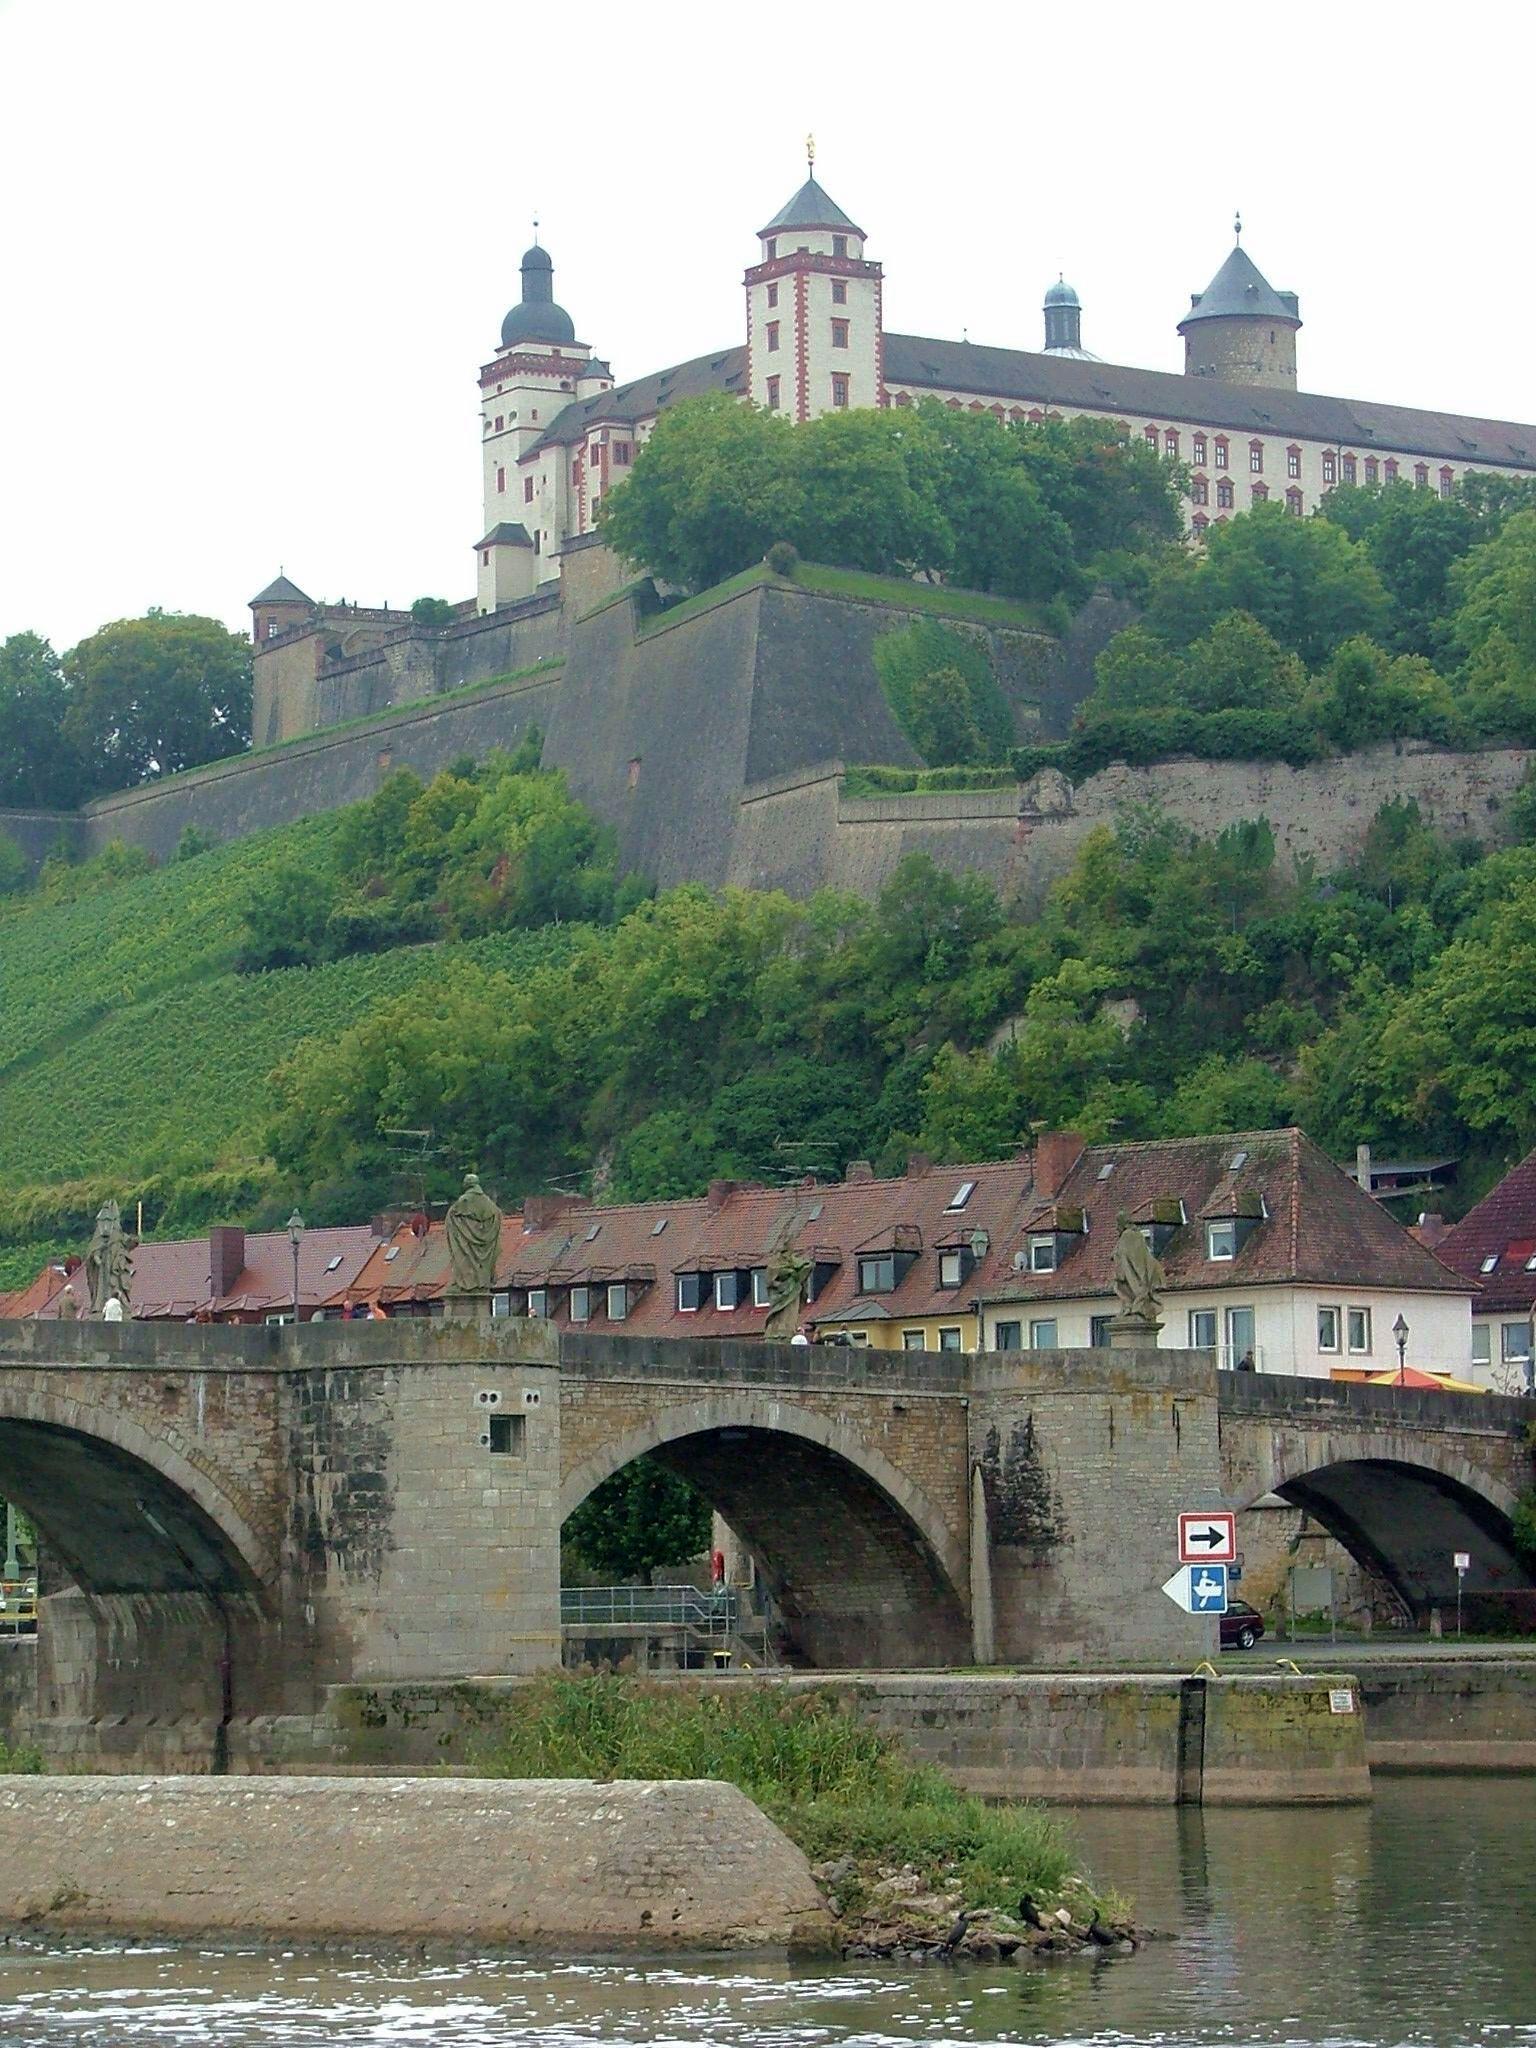 Wurzburg Old Bridge and the Fortress Marienberg